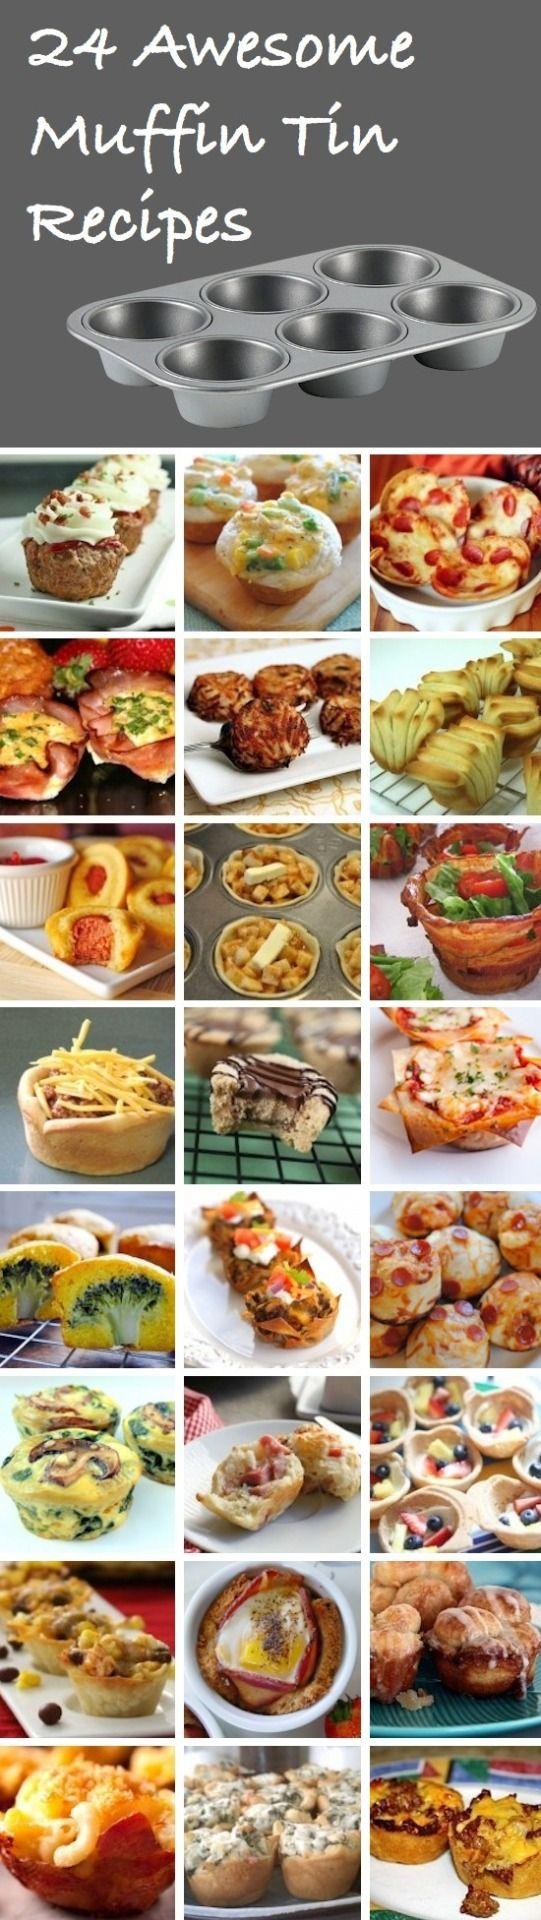 Meatloaf Cupcakes – recipebyphoto.com/meatloaf-cupcakes/ Mini Chicken Pot Pies – recipebyphoto.com/mini-chicken-pot-pies/ Mini Deep Dish Pizzas – recipebyphoto.com/mini-tortilla-crust-pizzas/ Ham & Egg Cups –...